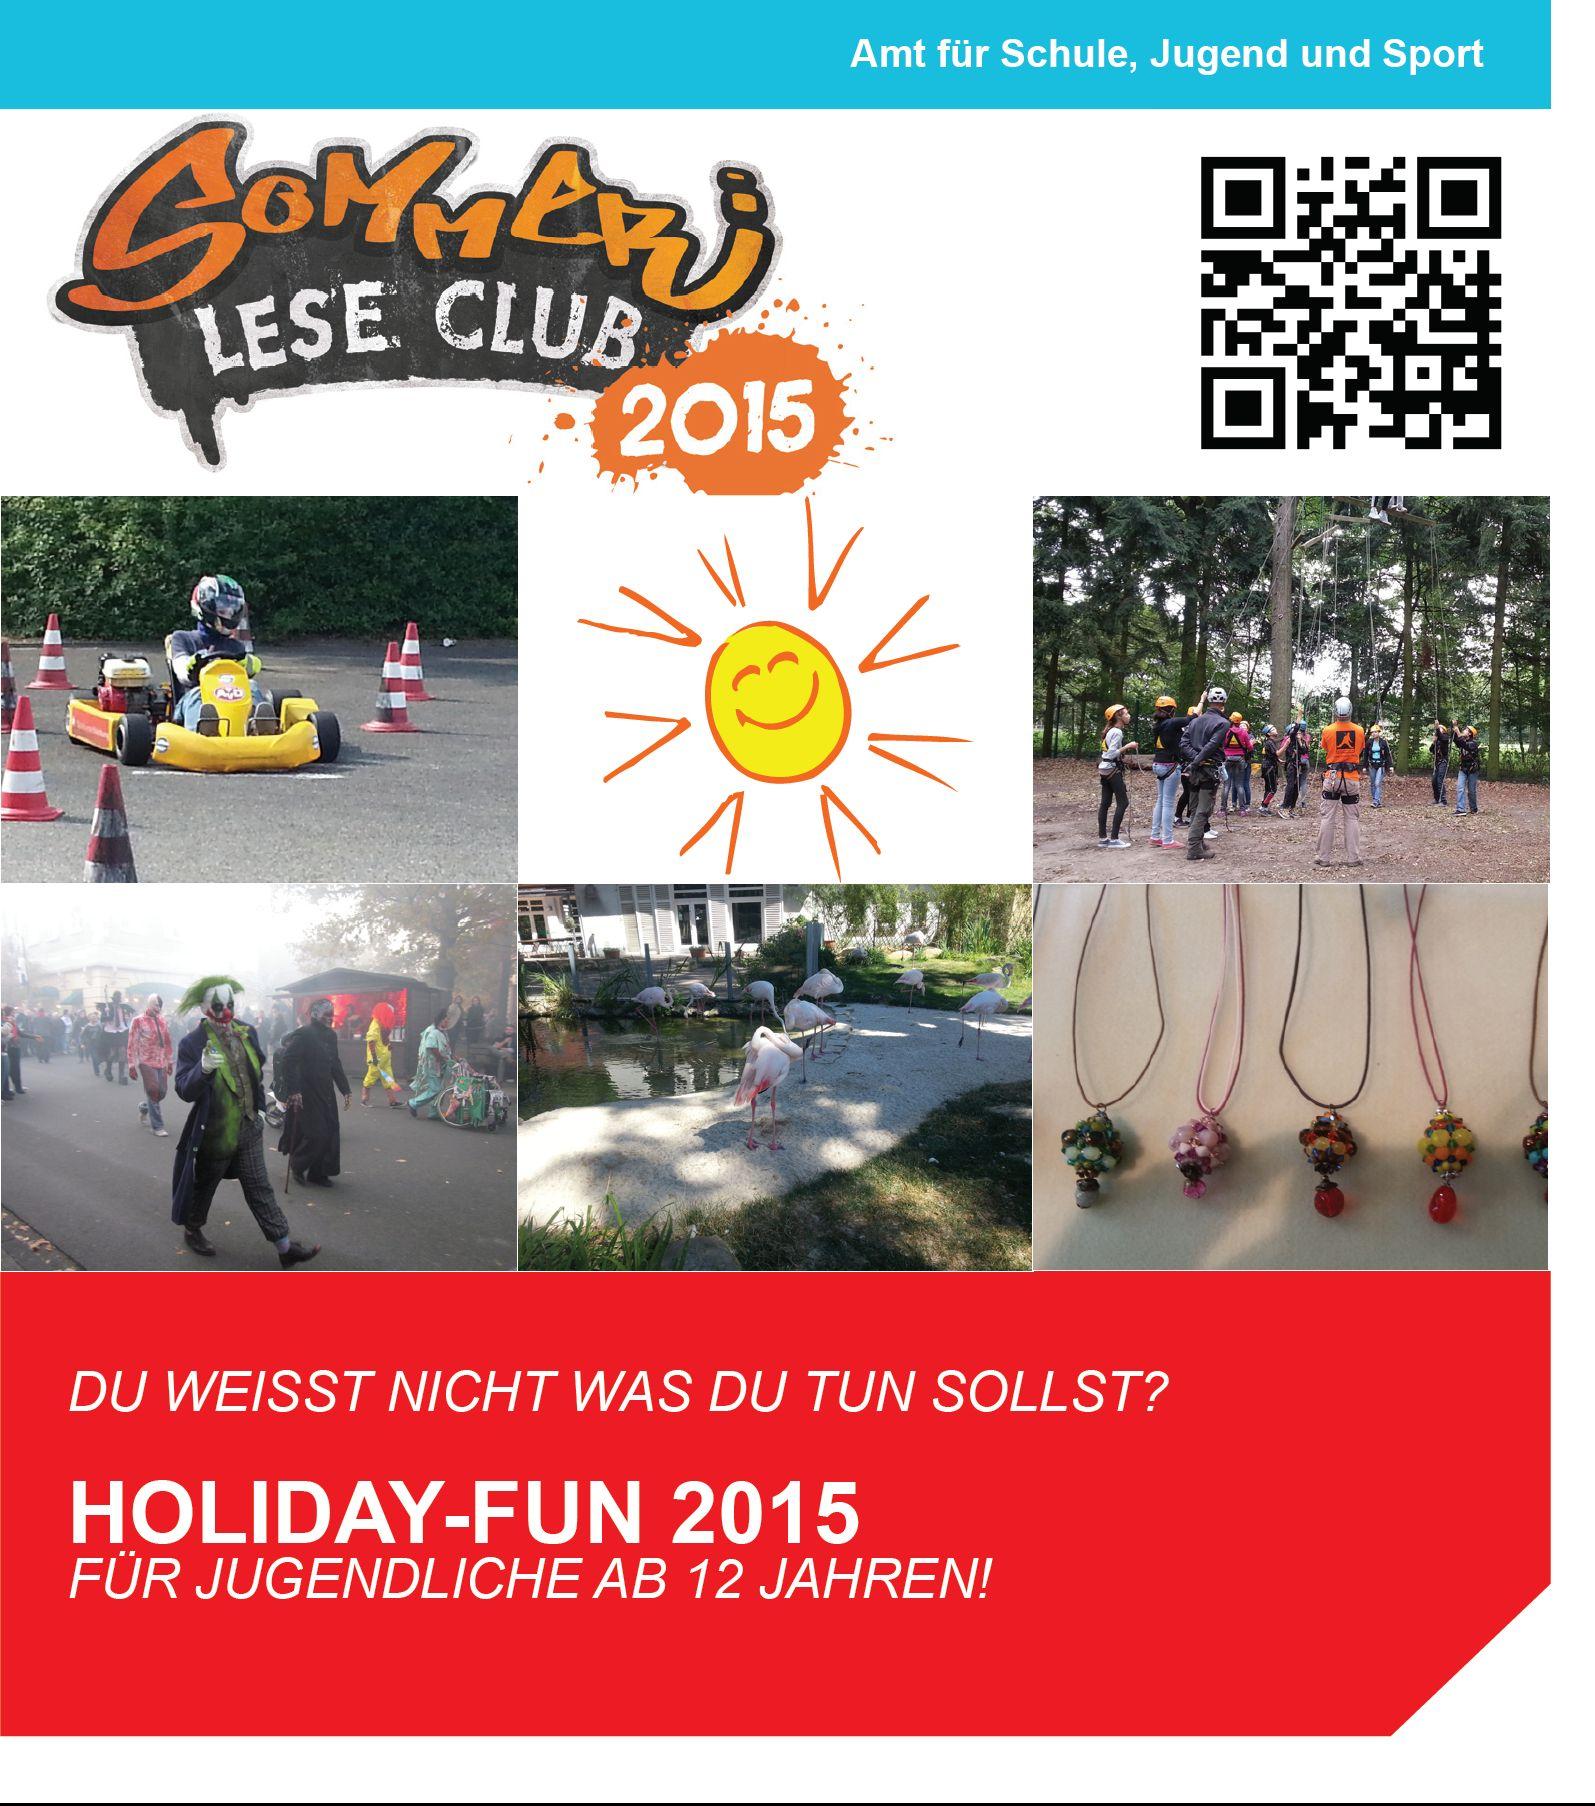 Holiday-Fun2015)